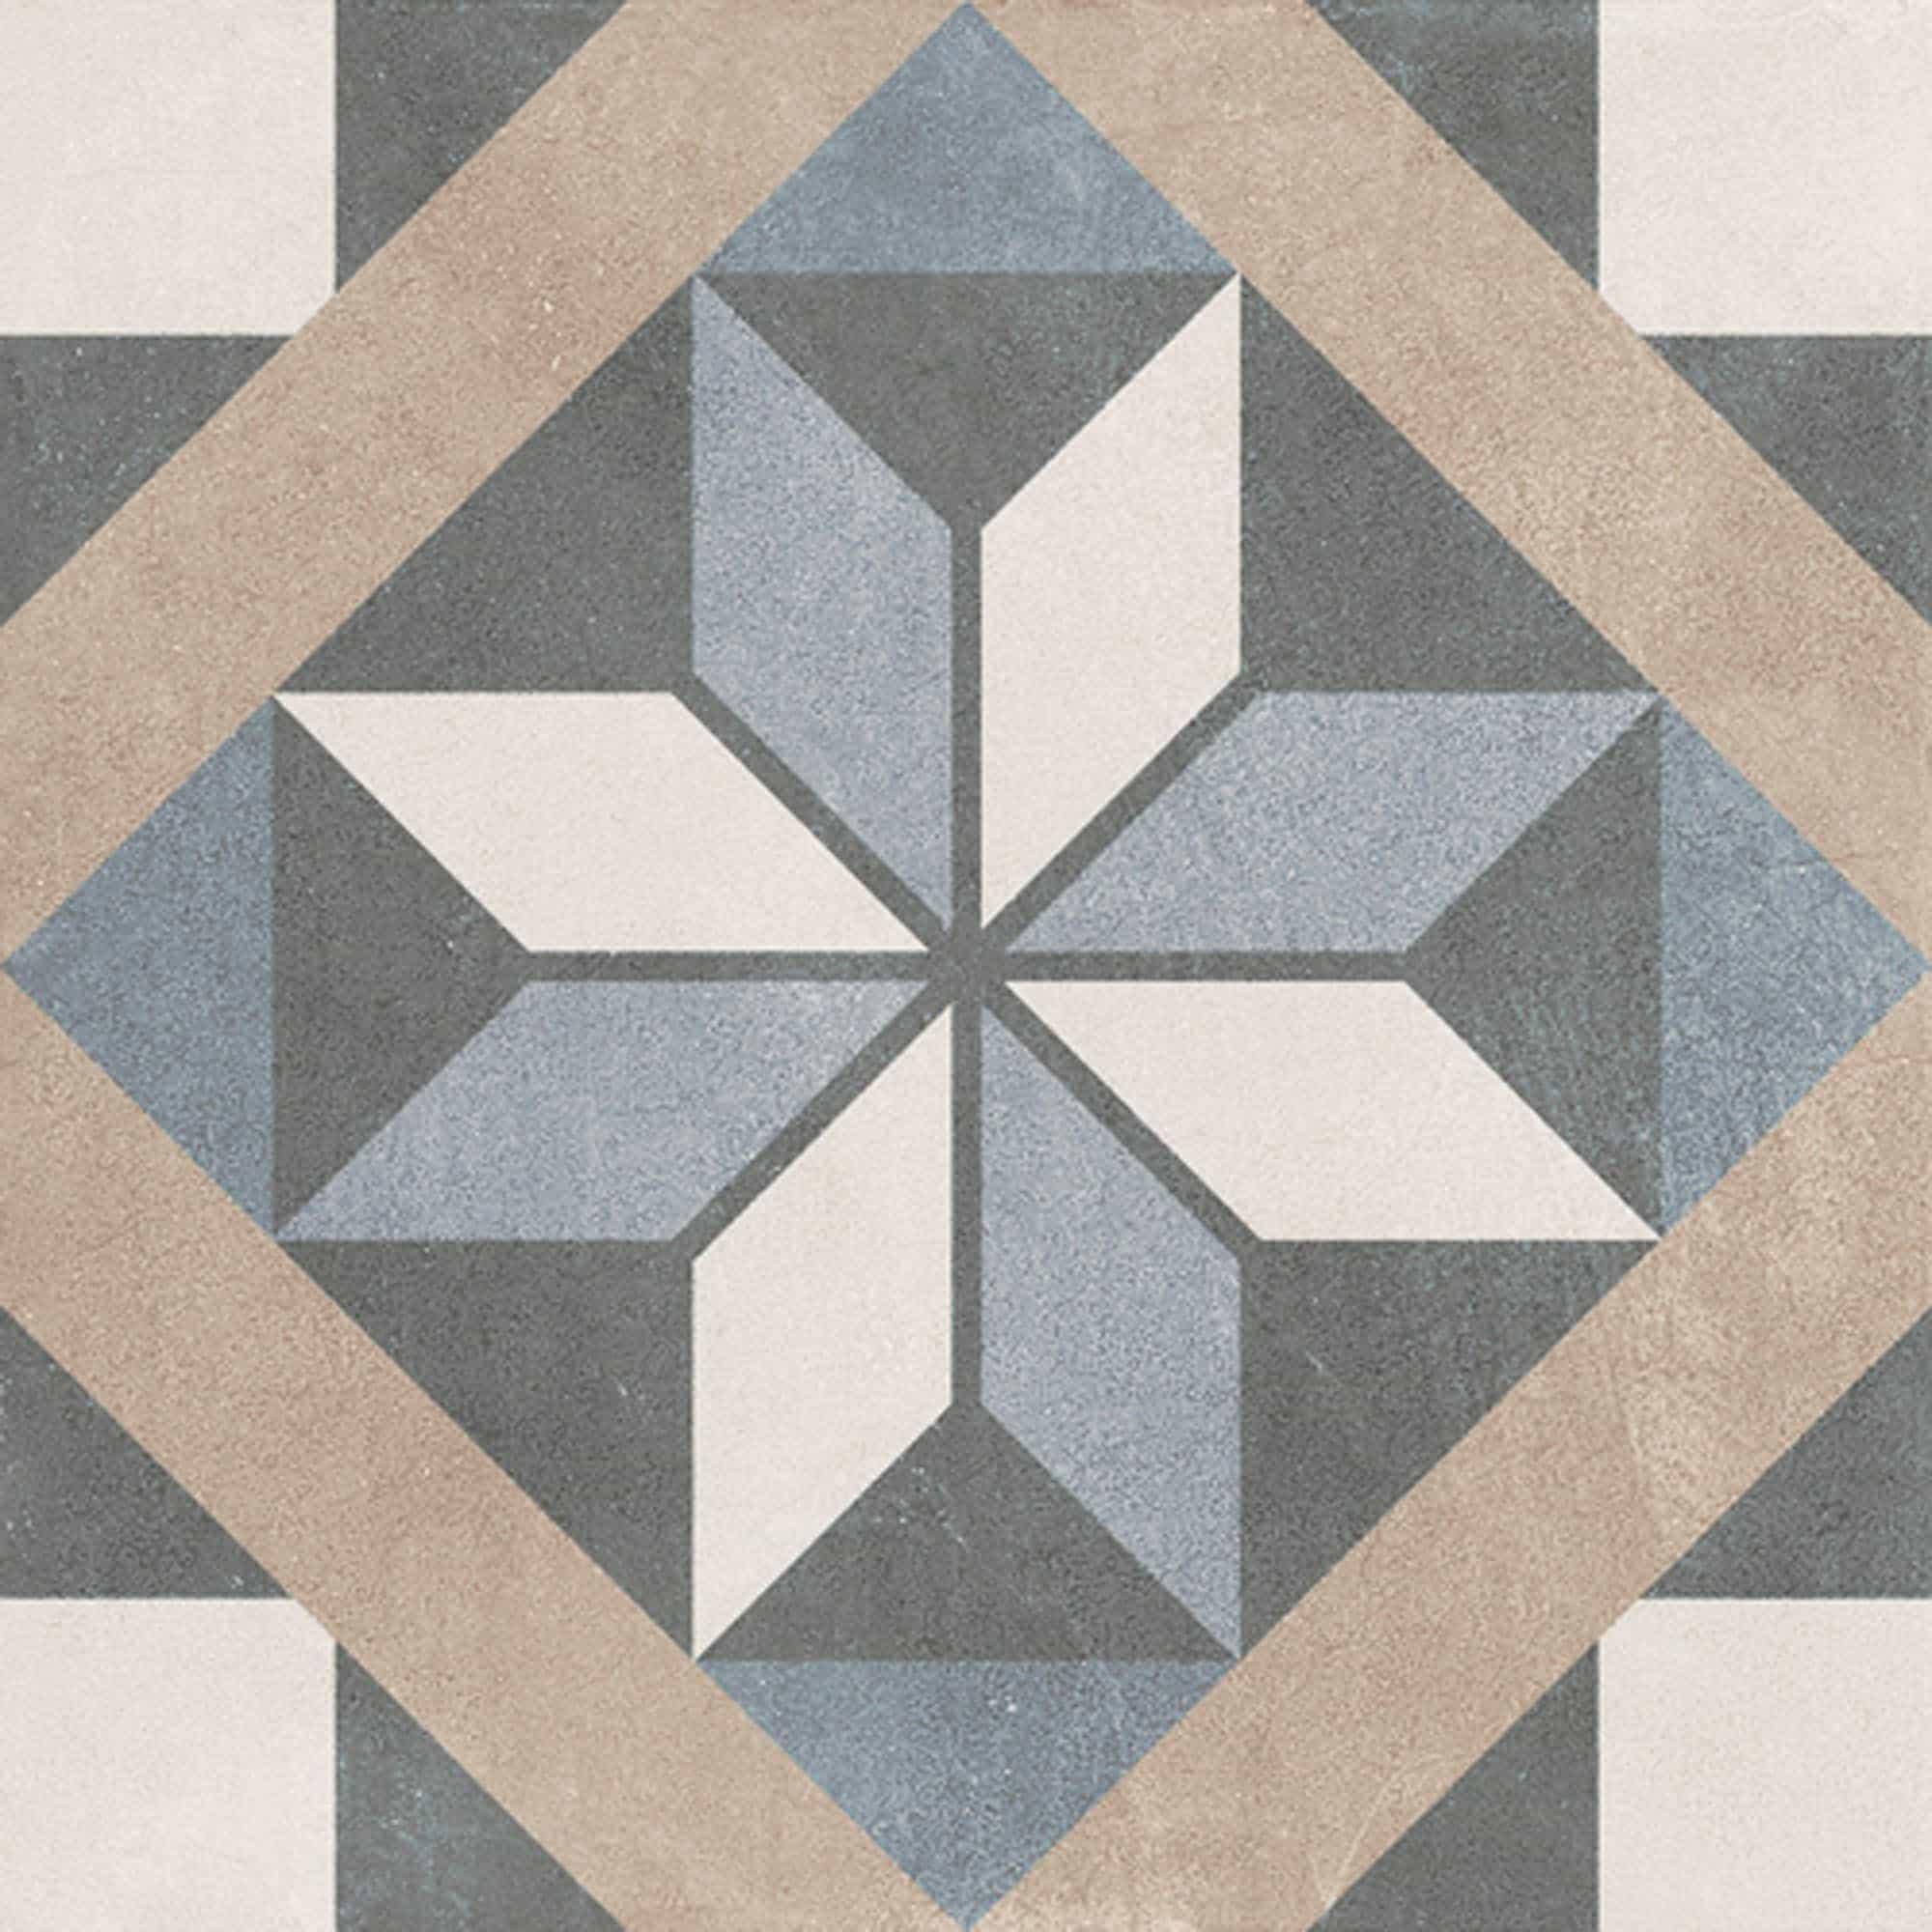 Vloertegels patroon - Patchwork Classic 04